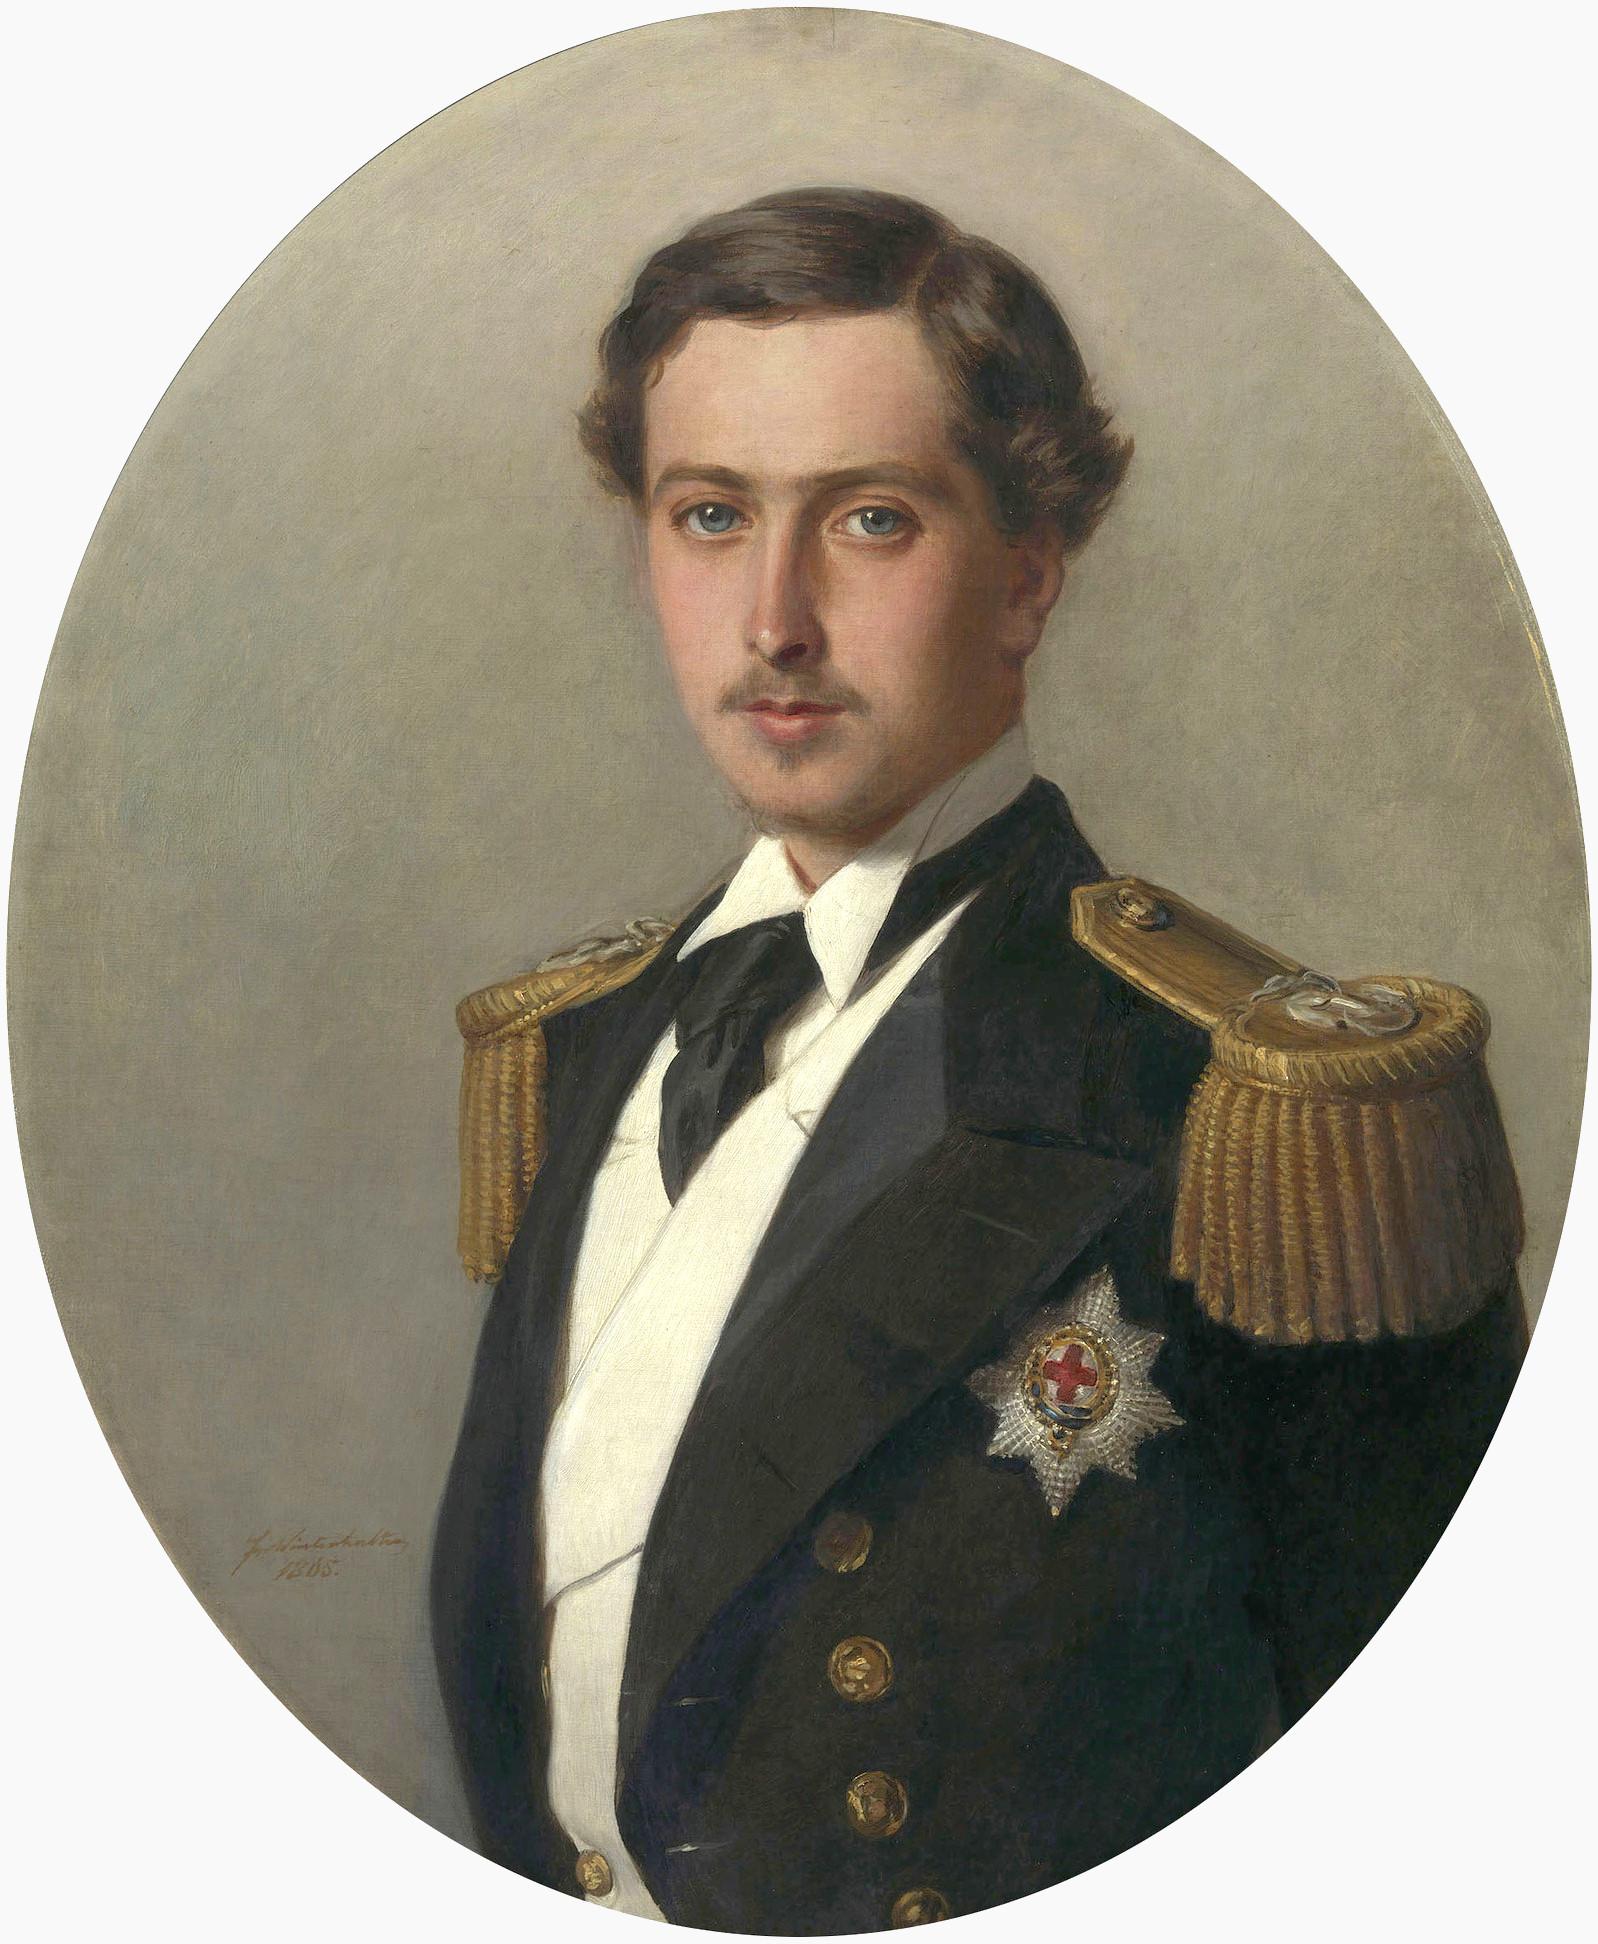 File:Prince Alfred (1844-1900), later Duke of Edinburgh.jpg - Wikipedia